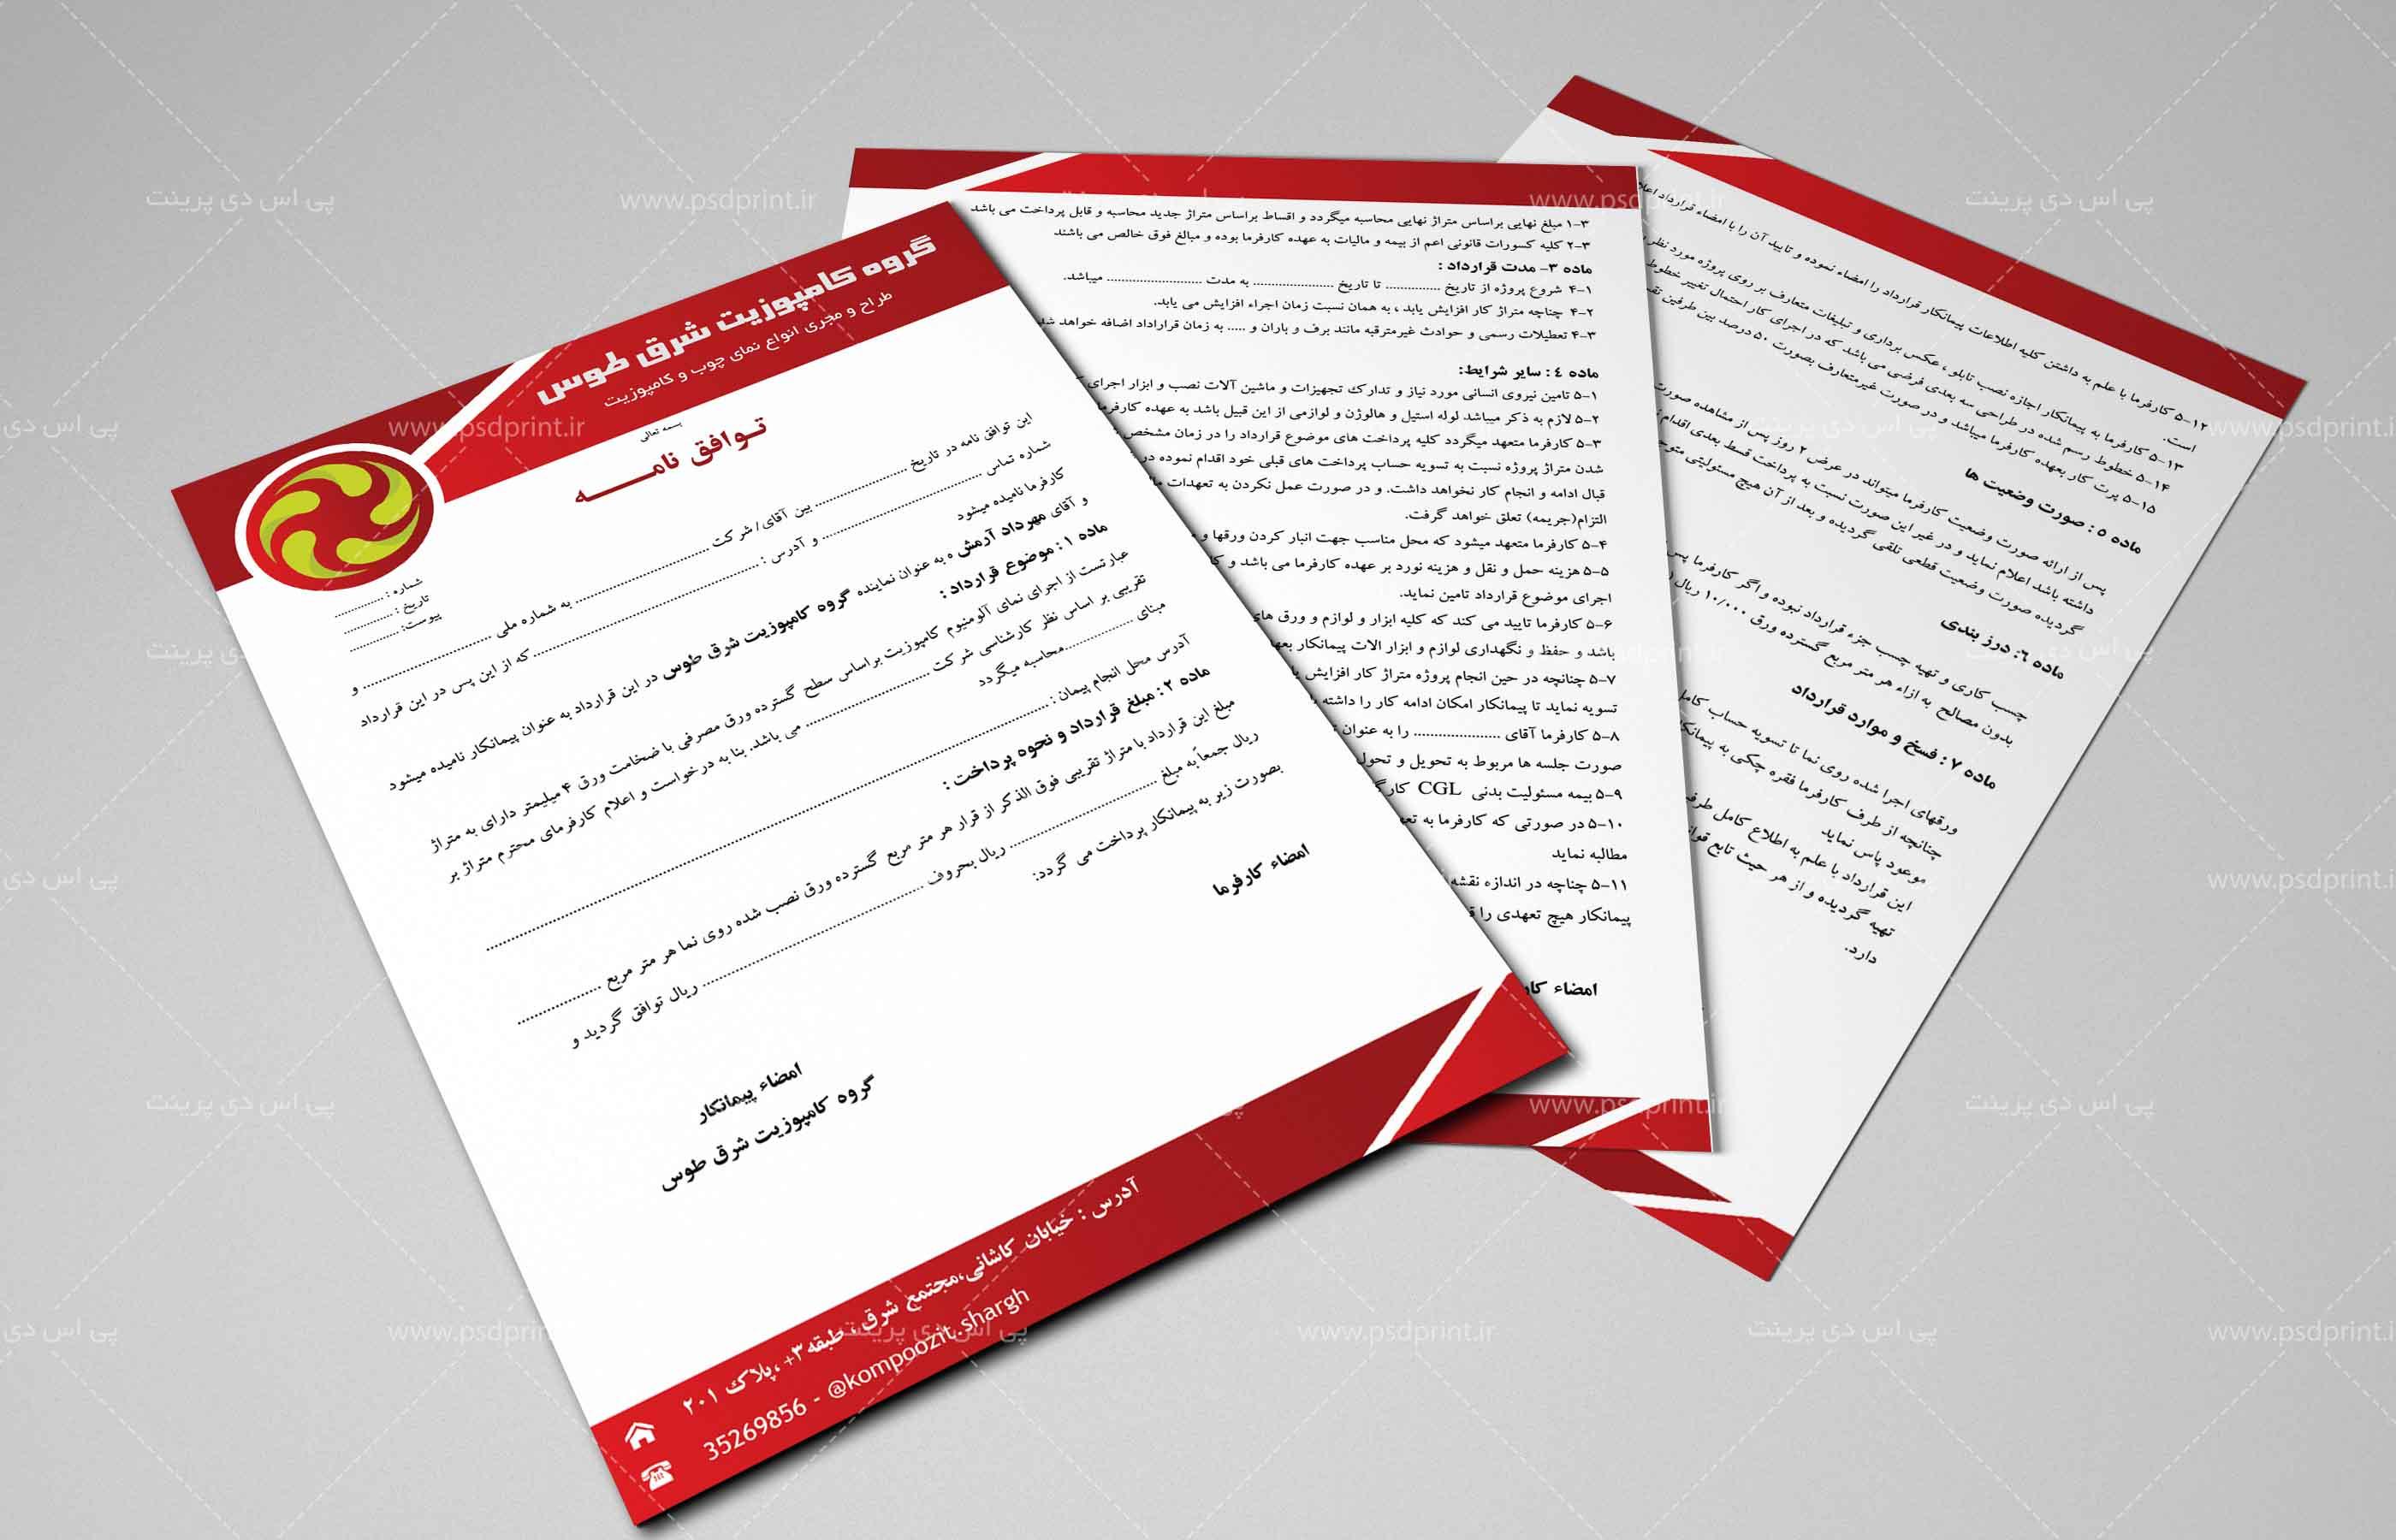 فرم قرارداد کامپوزیت کار